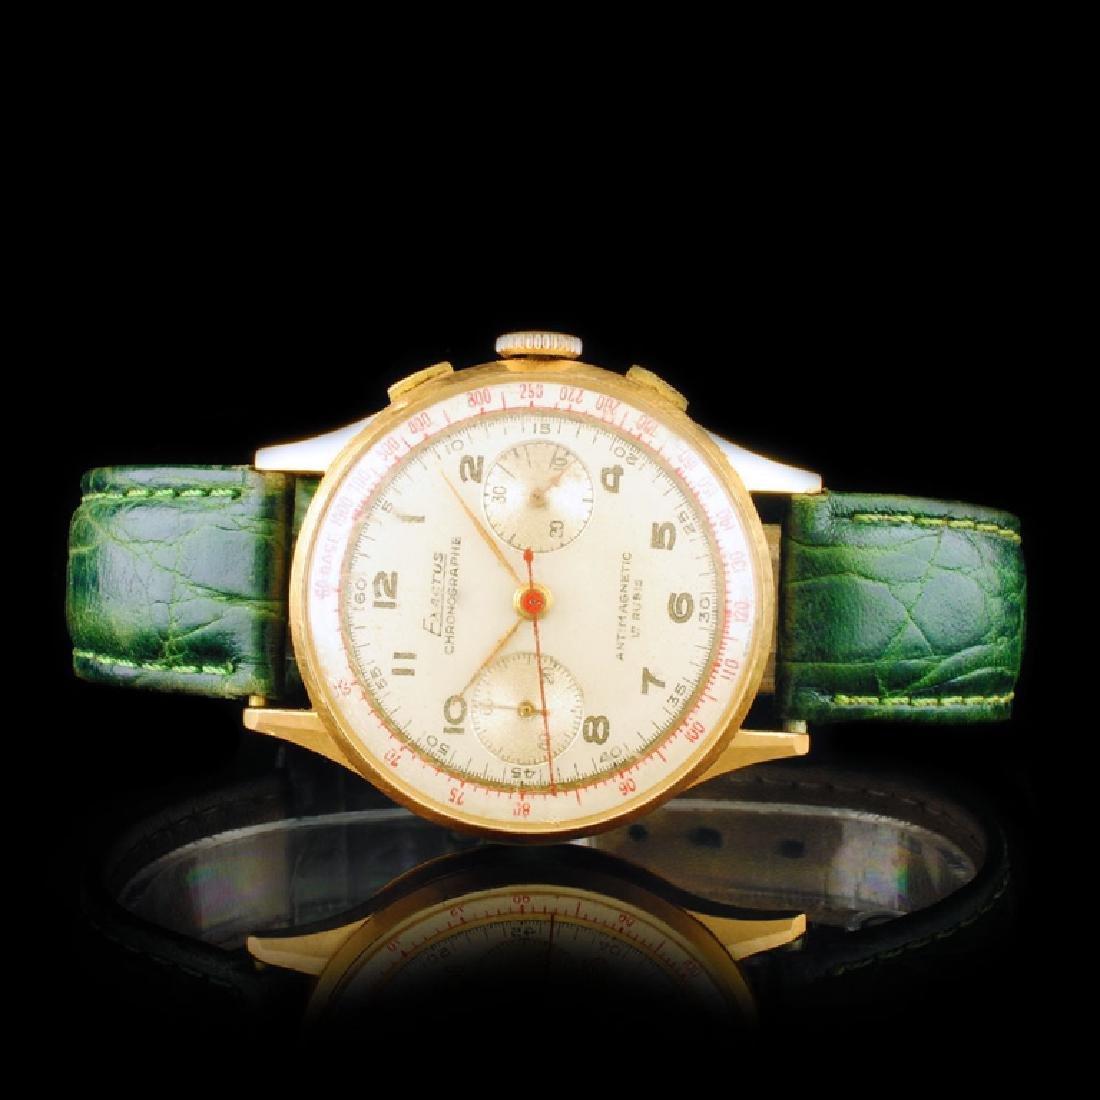 Exactus Chronographe 18K Gold 35mm Wristwatch